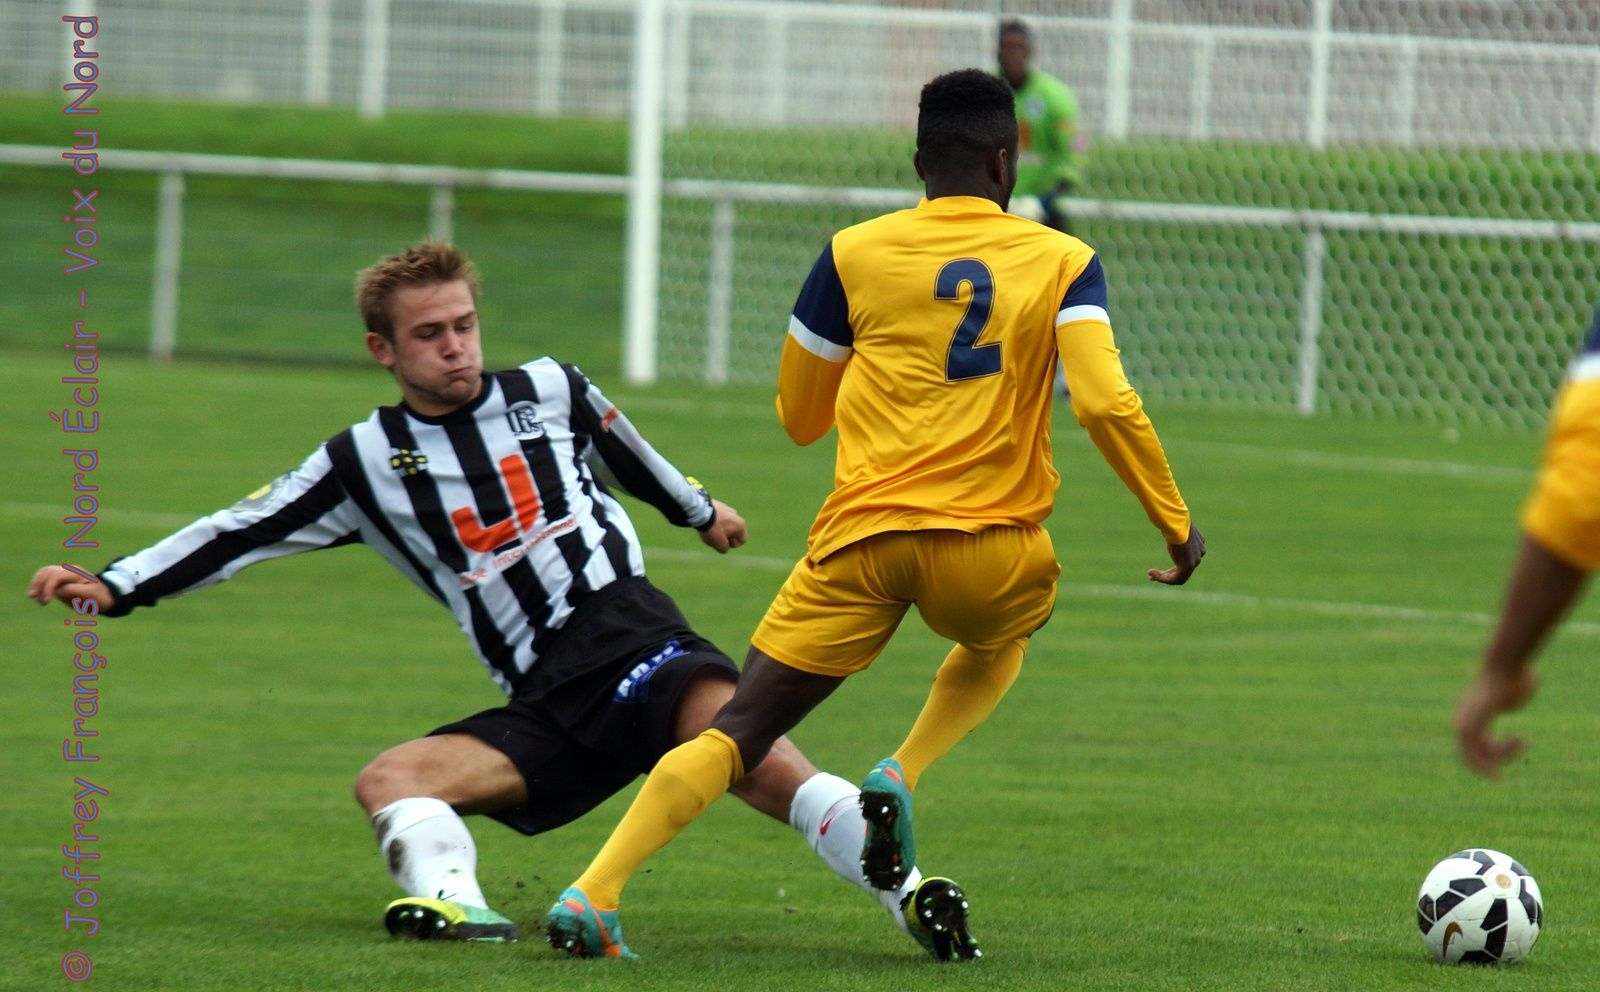 30.08.14 CFA 2 J2 Tourcoing - Maccabi Paris